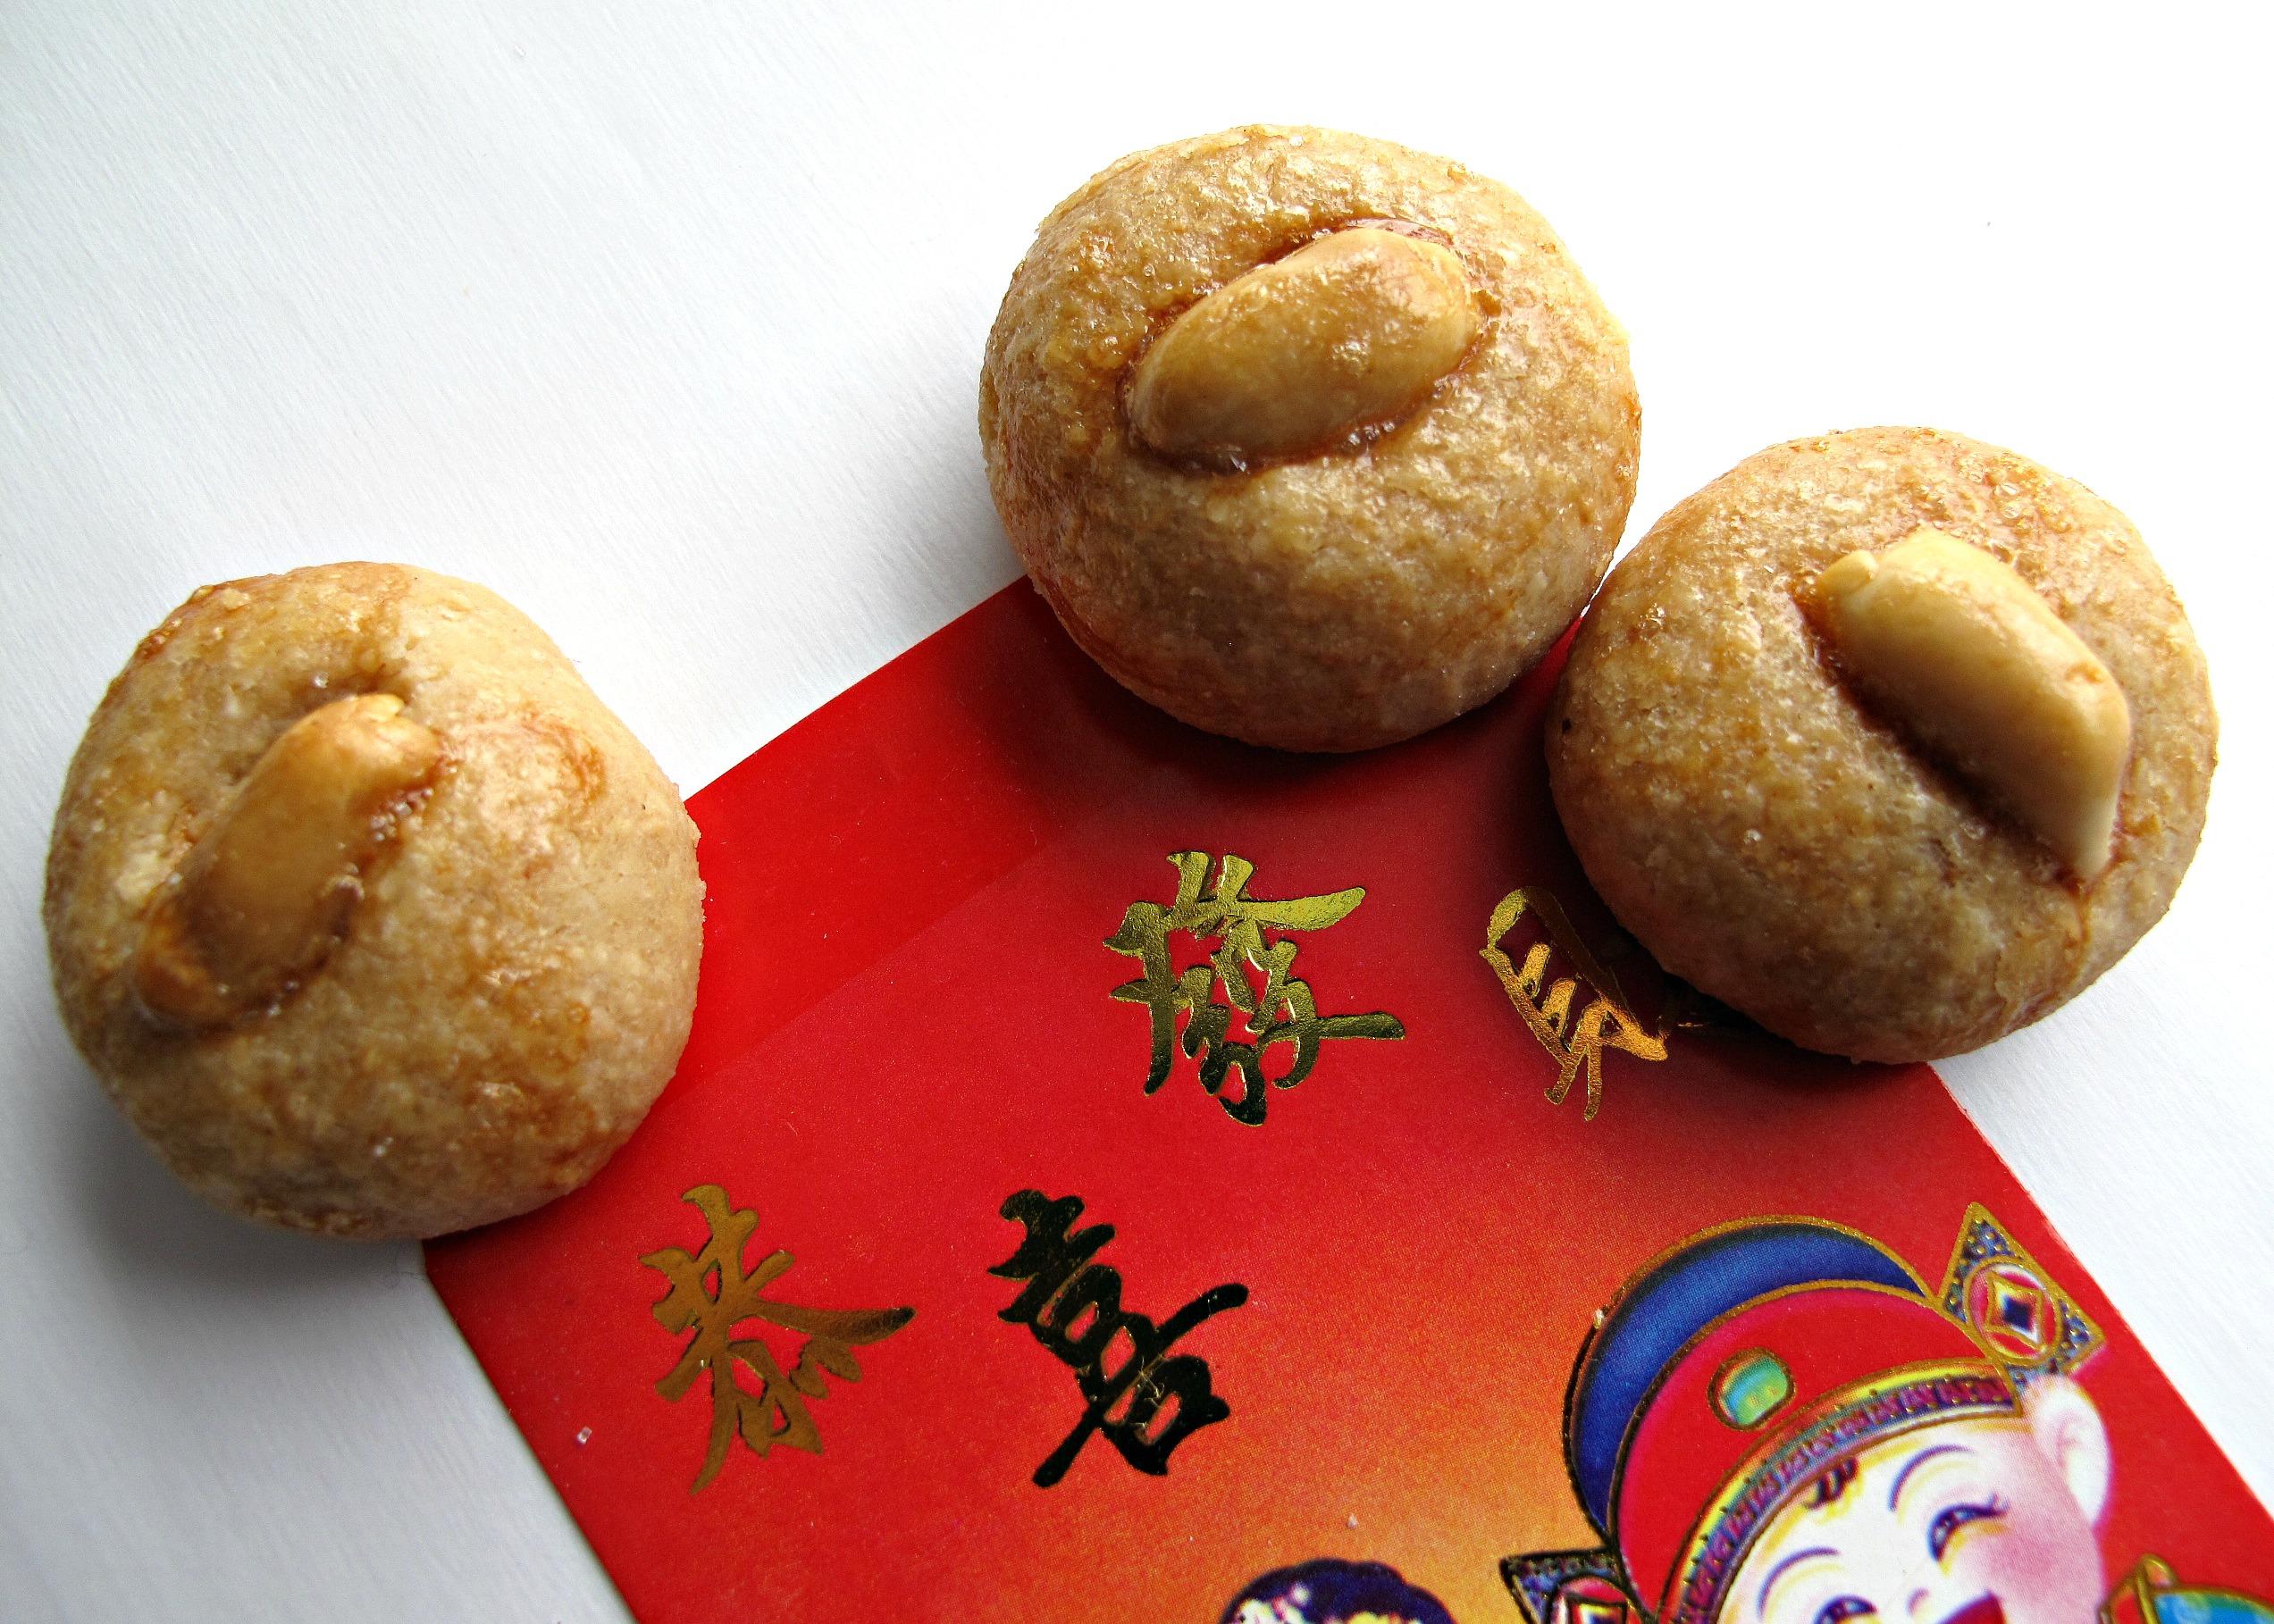 Chinese New Year Peanut Cookies (花生饼) - The Monday Box